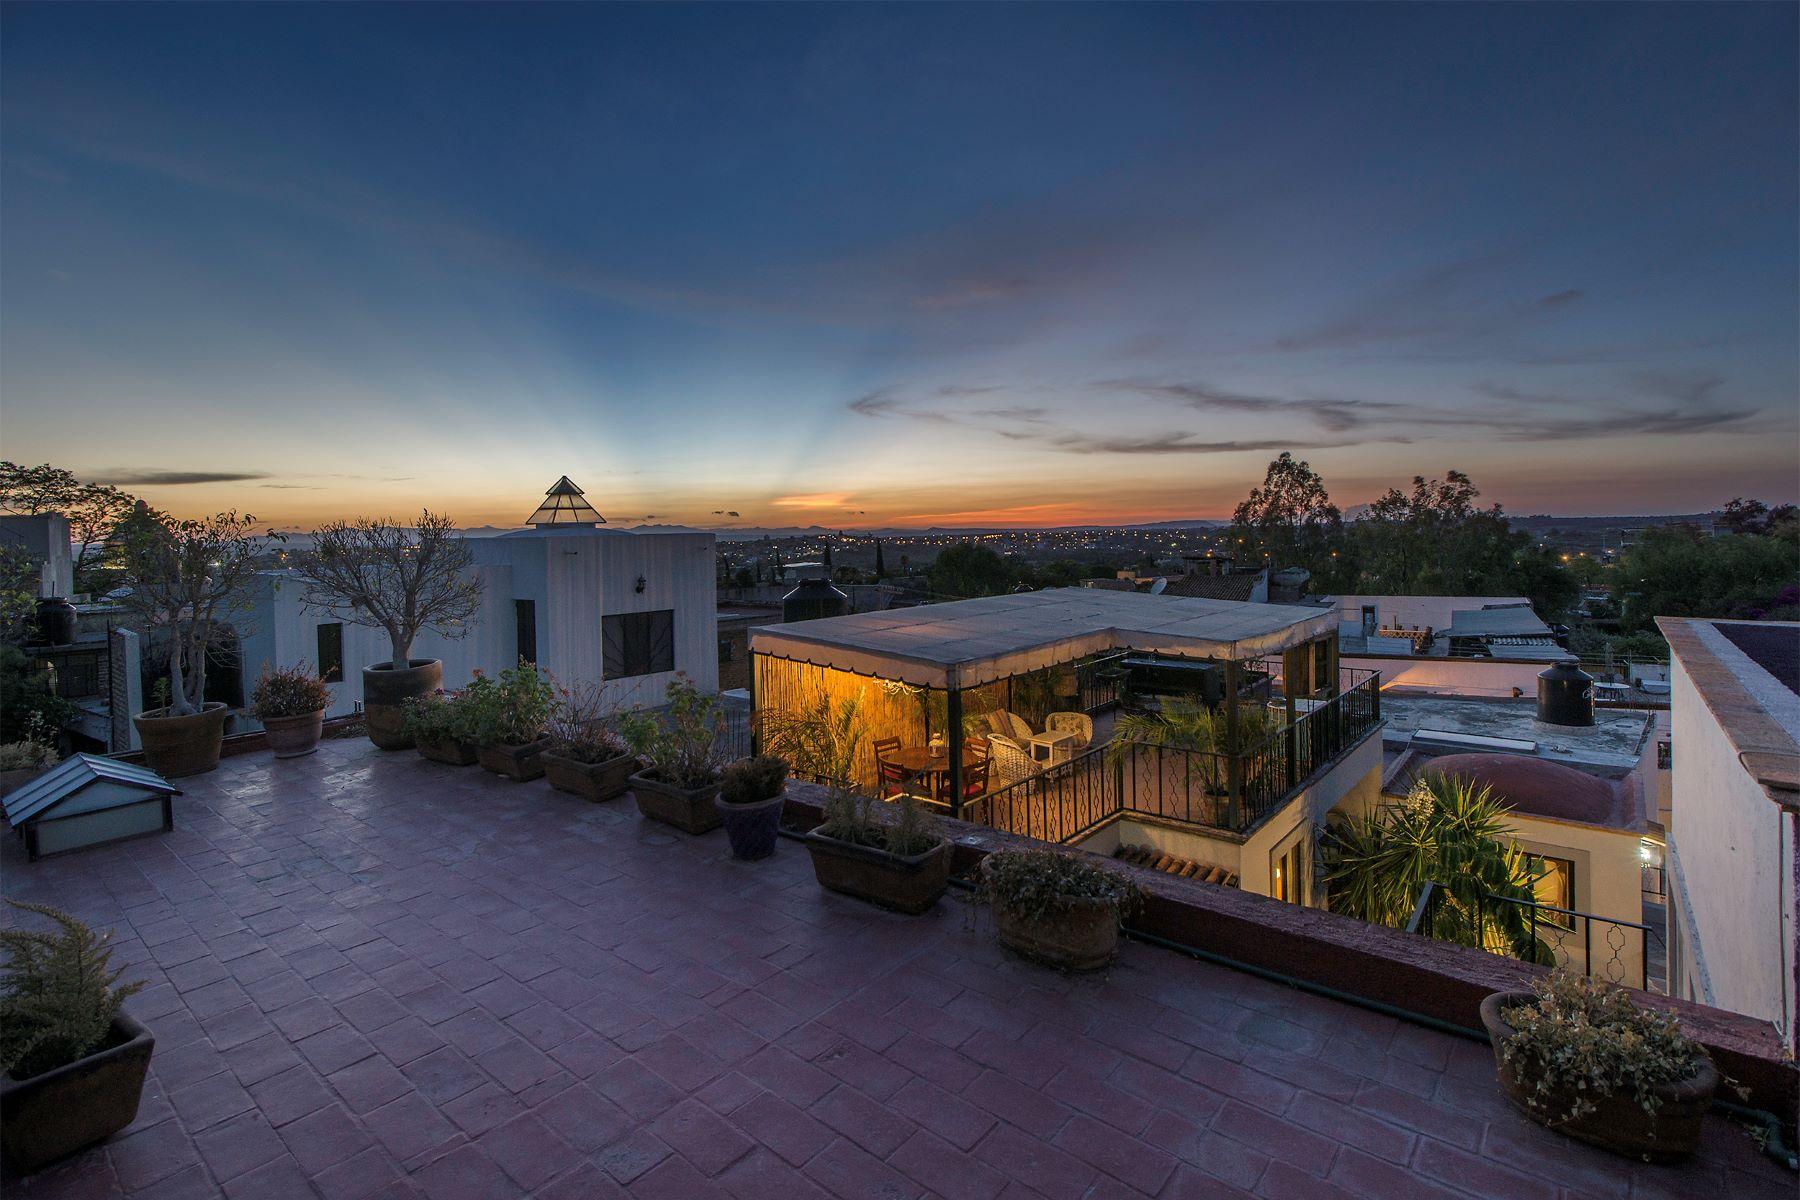 Additional photo for property listing at Casitas Aparicio Centro, San Miguel De Allende, Guanajuato México